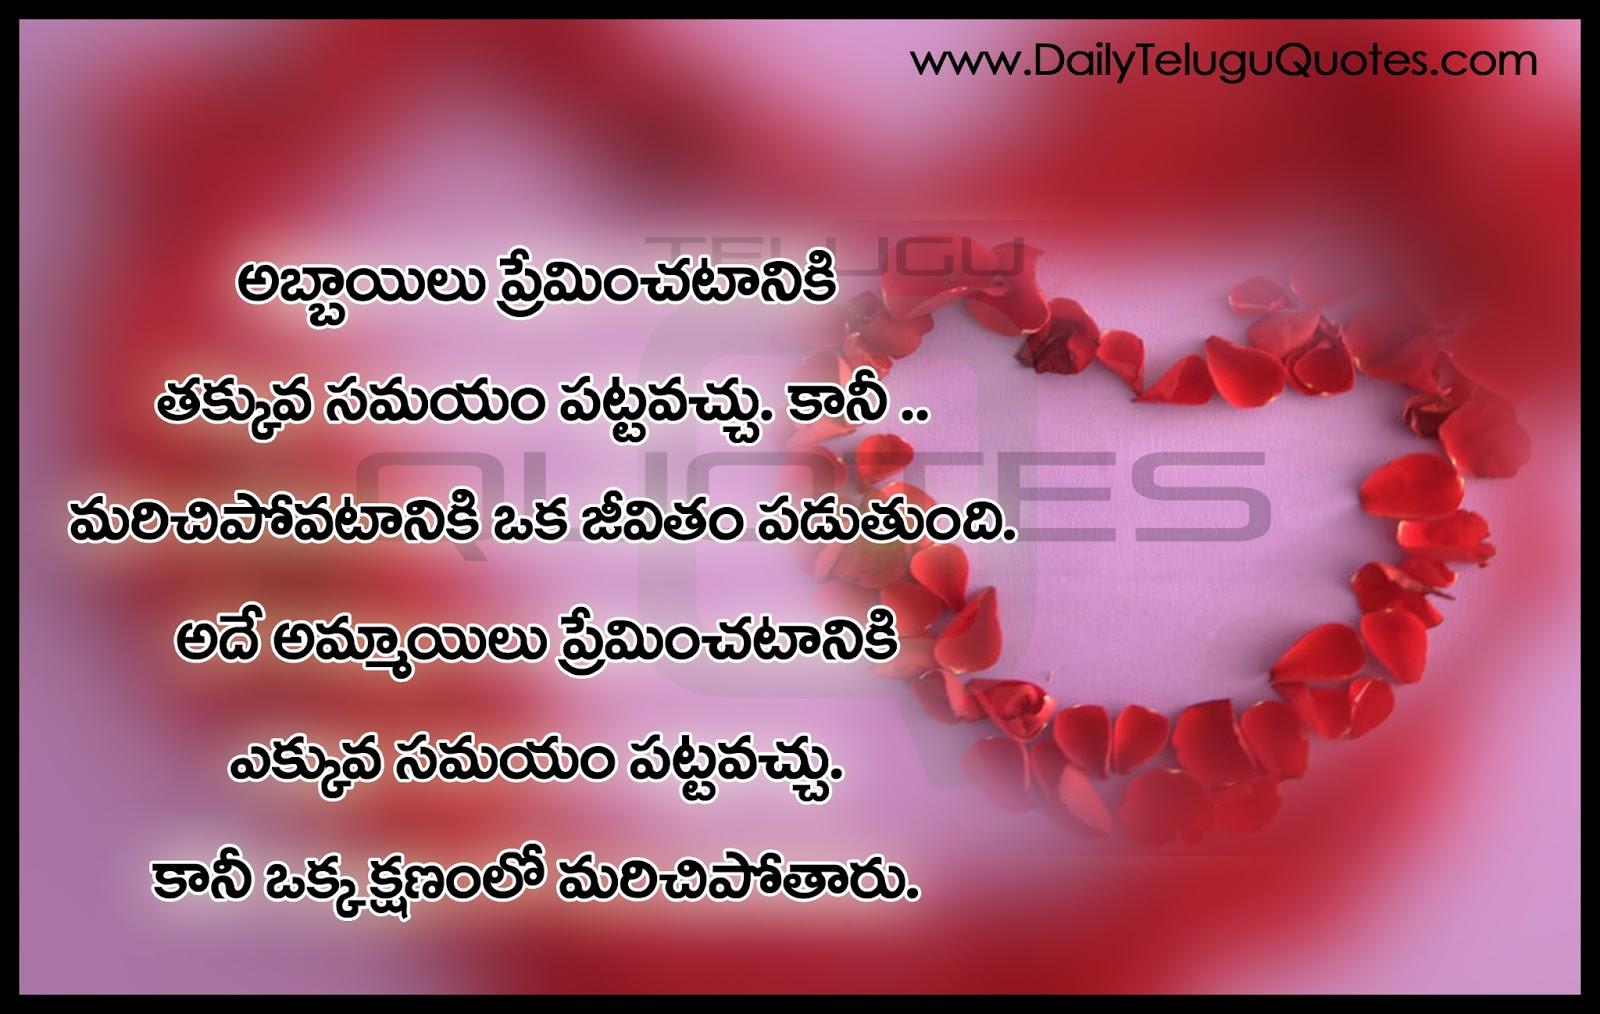 Telugu Love Quotes and Sayings | DAILYTELUGUQUOTES.COM ...